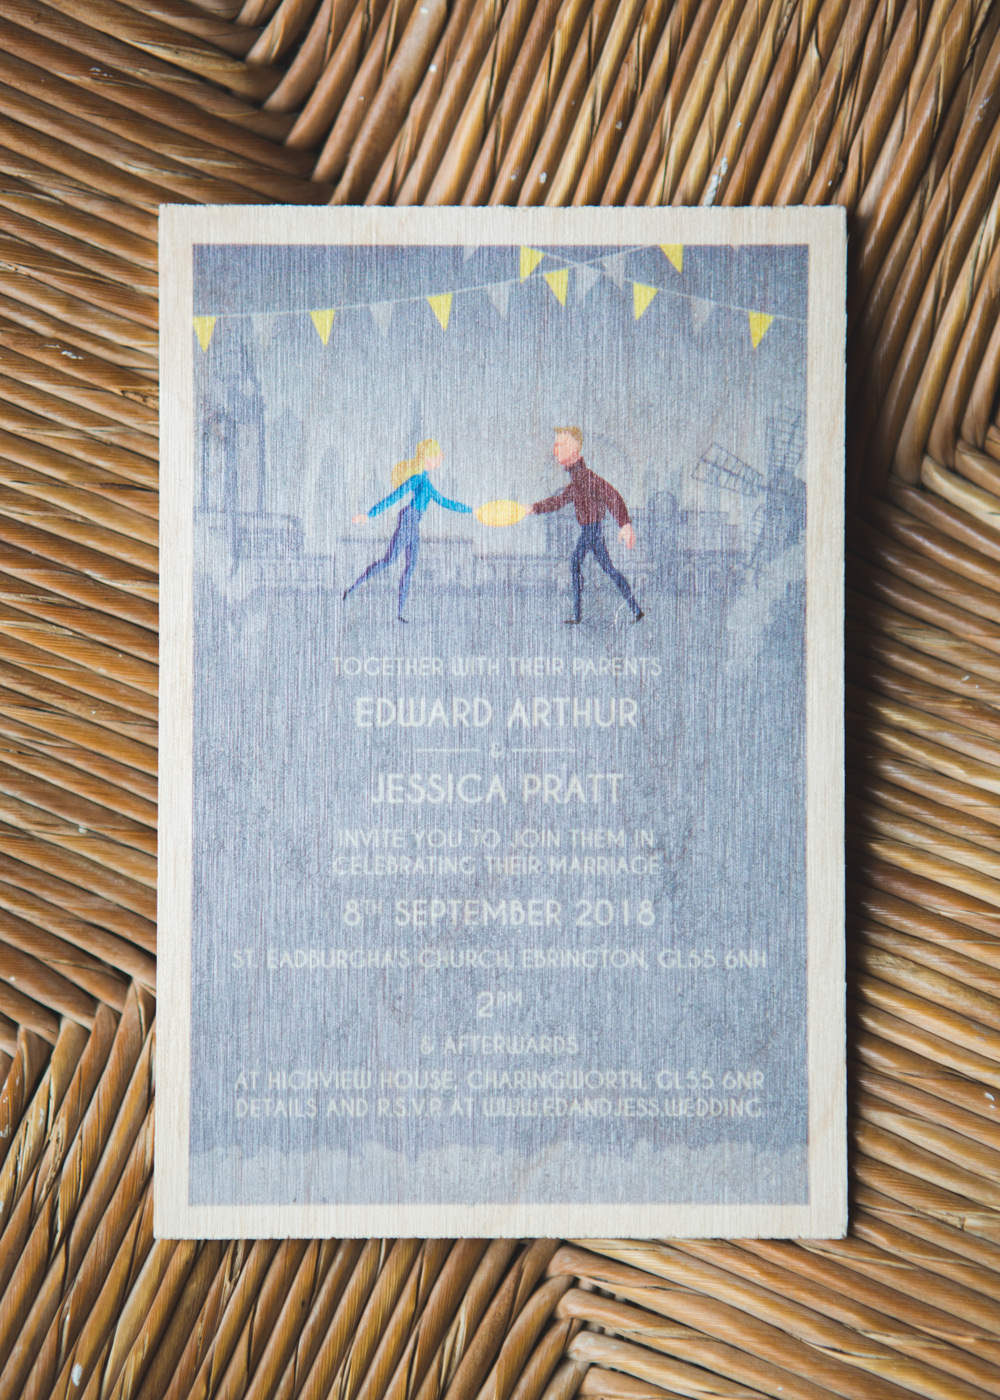 Stationery Invite Invitations Bunting Airbnb Wedding Pickavance Weddings